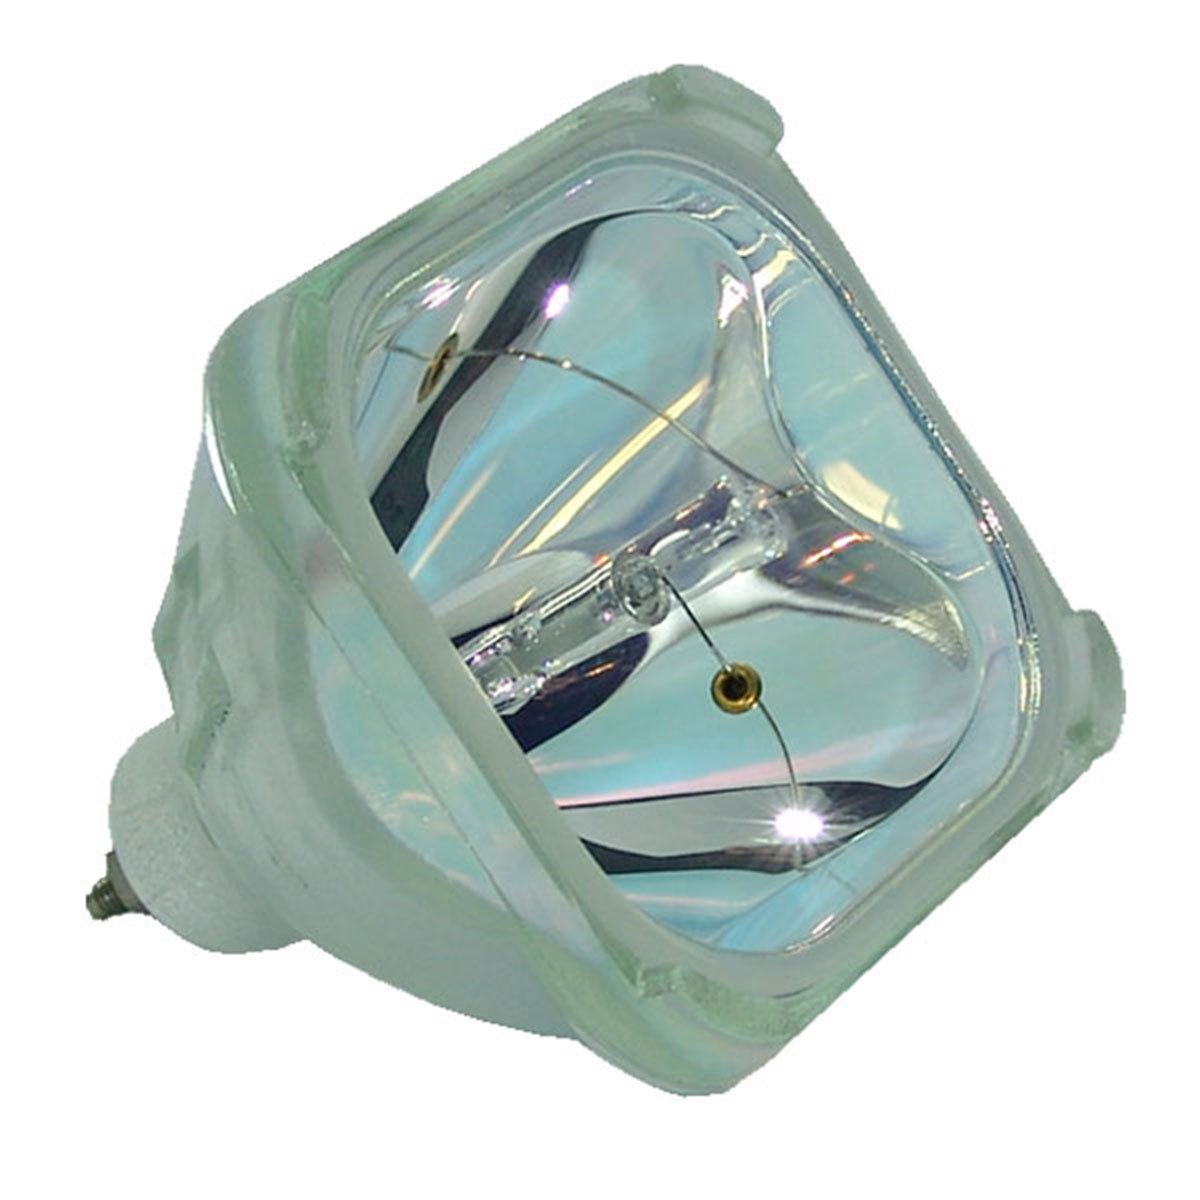 philips xl 5100 replacement bulb for sony kds r50xbr1 kdsr50xbr1 tv. Black Bedroom Furniture Sets. Home Design Ideas